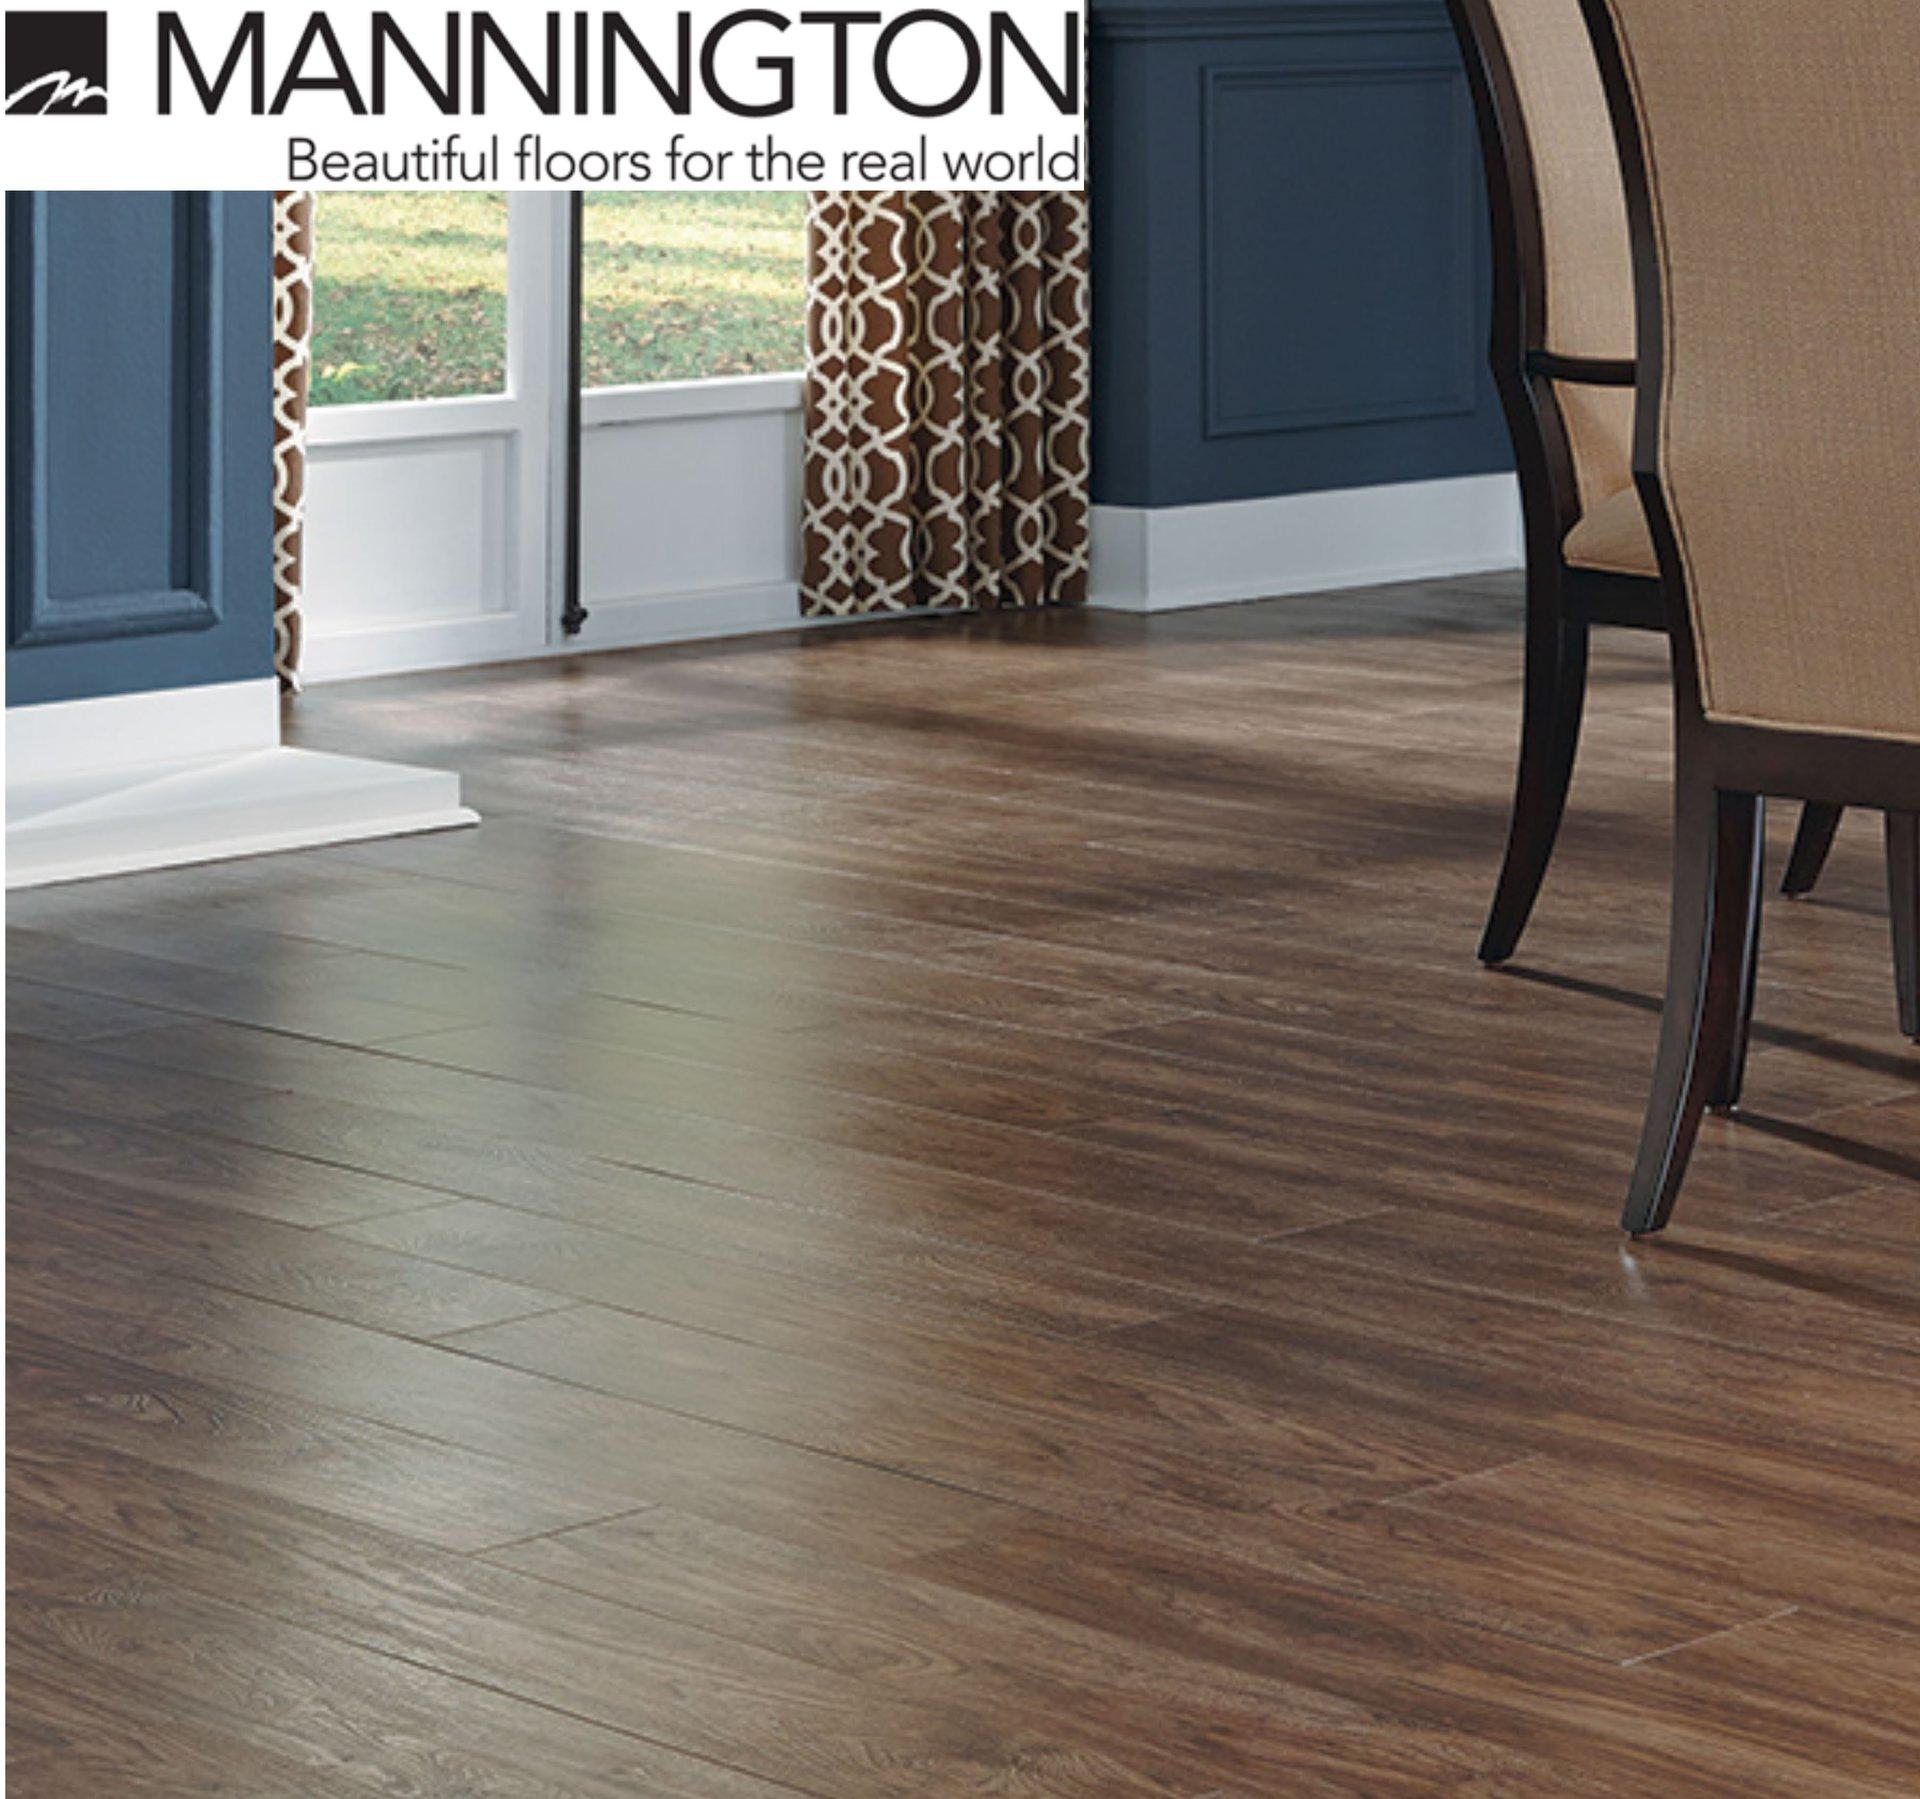 Mannington Adura Max Vinyl Plank